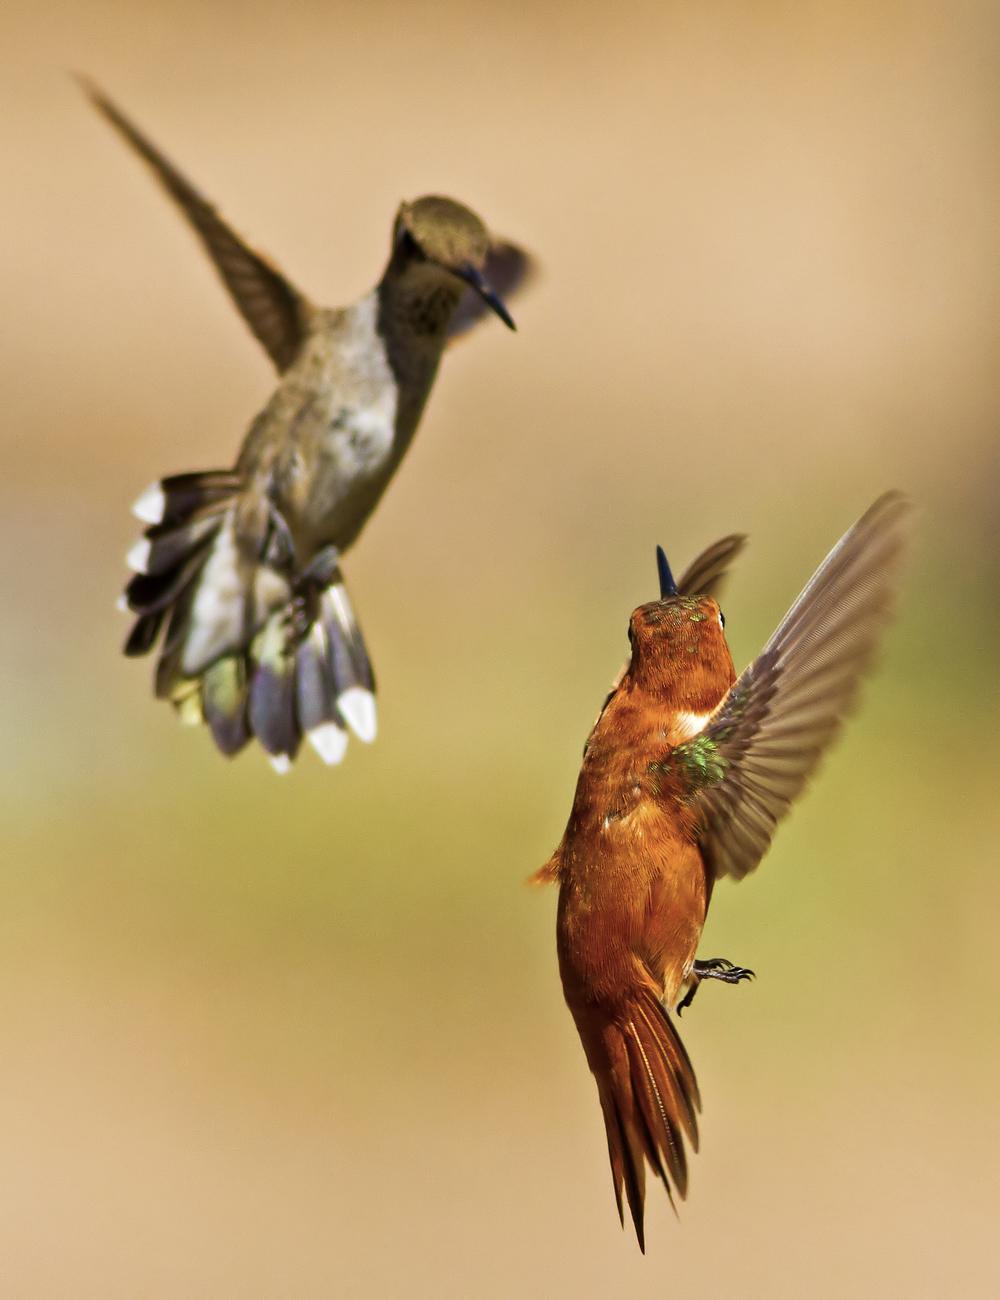 120 - Hummingbird